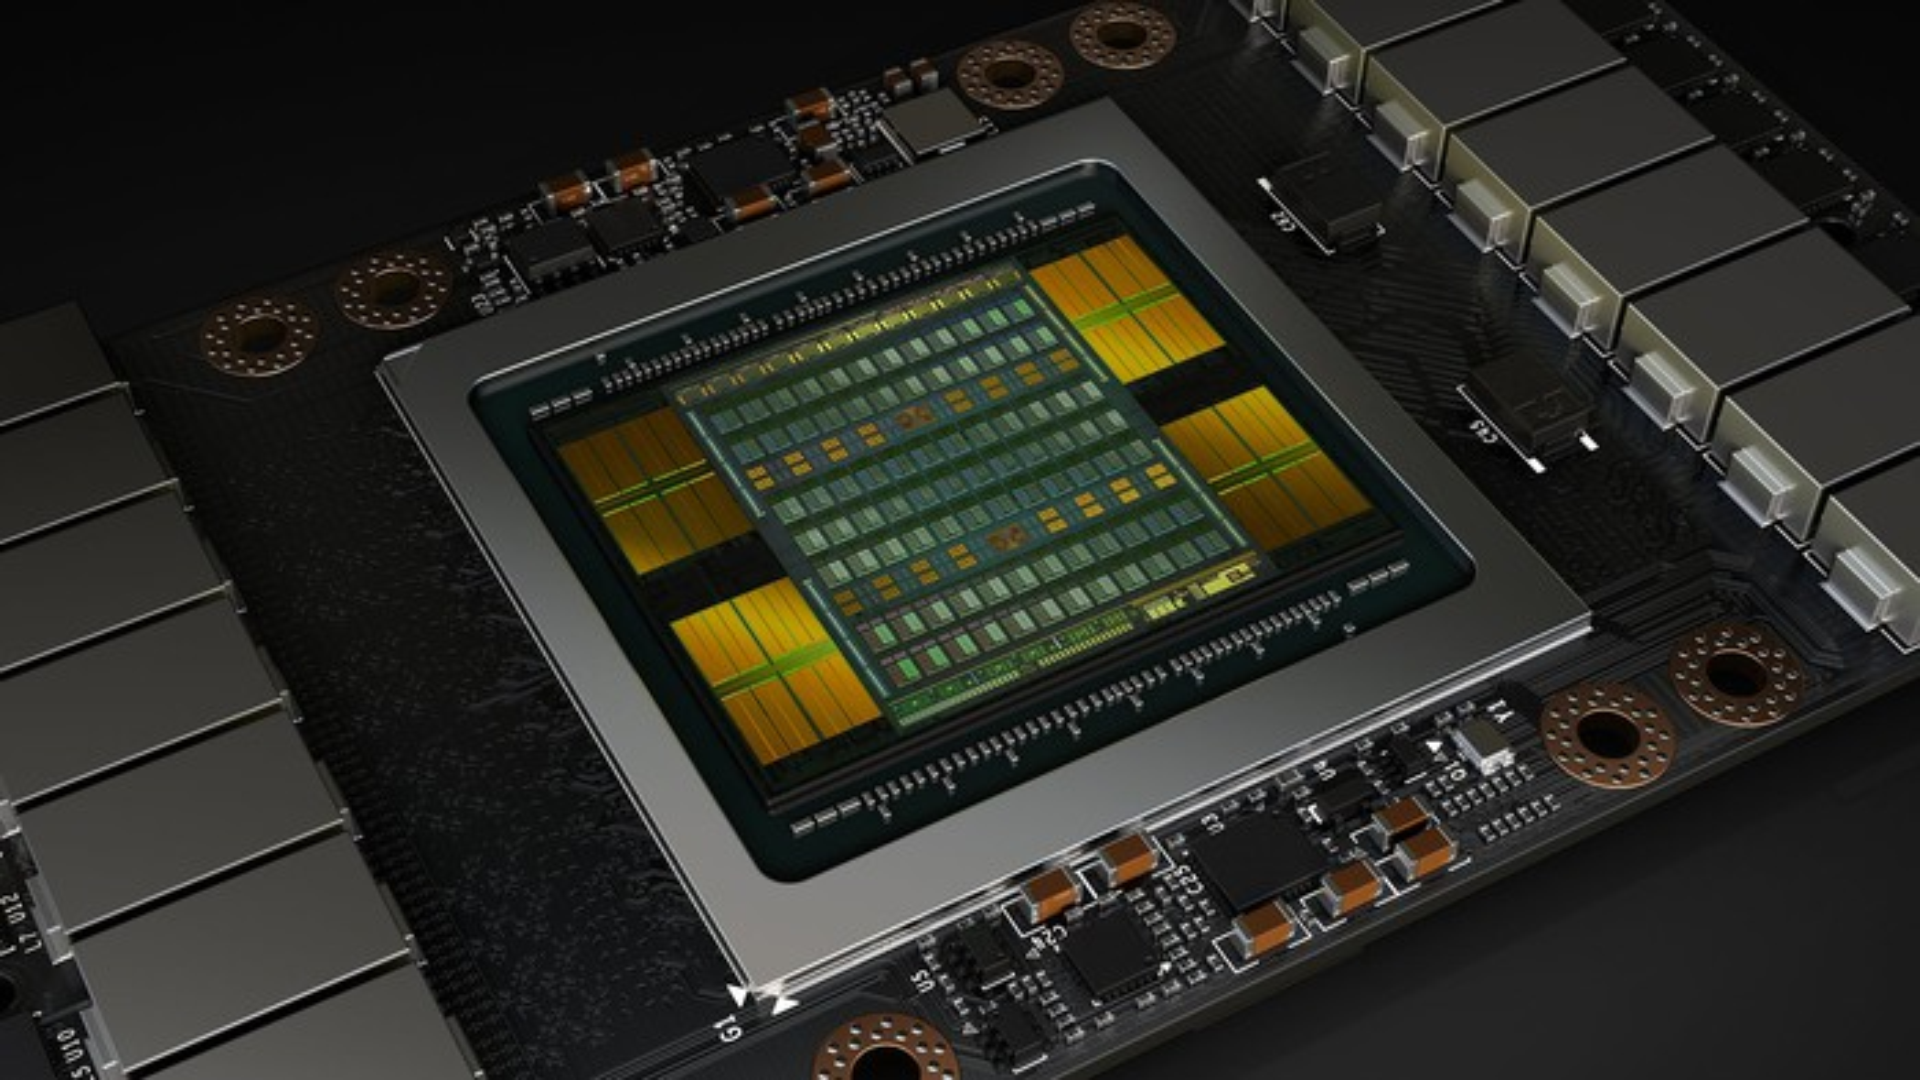 A close-up of an Nvidia graphic processing unit (GPU).